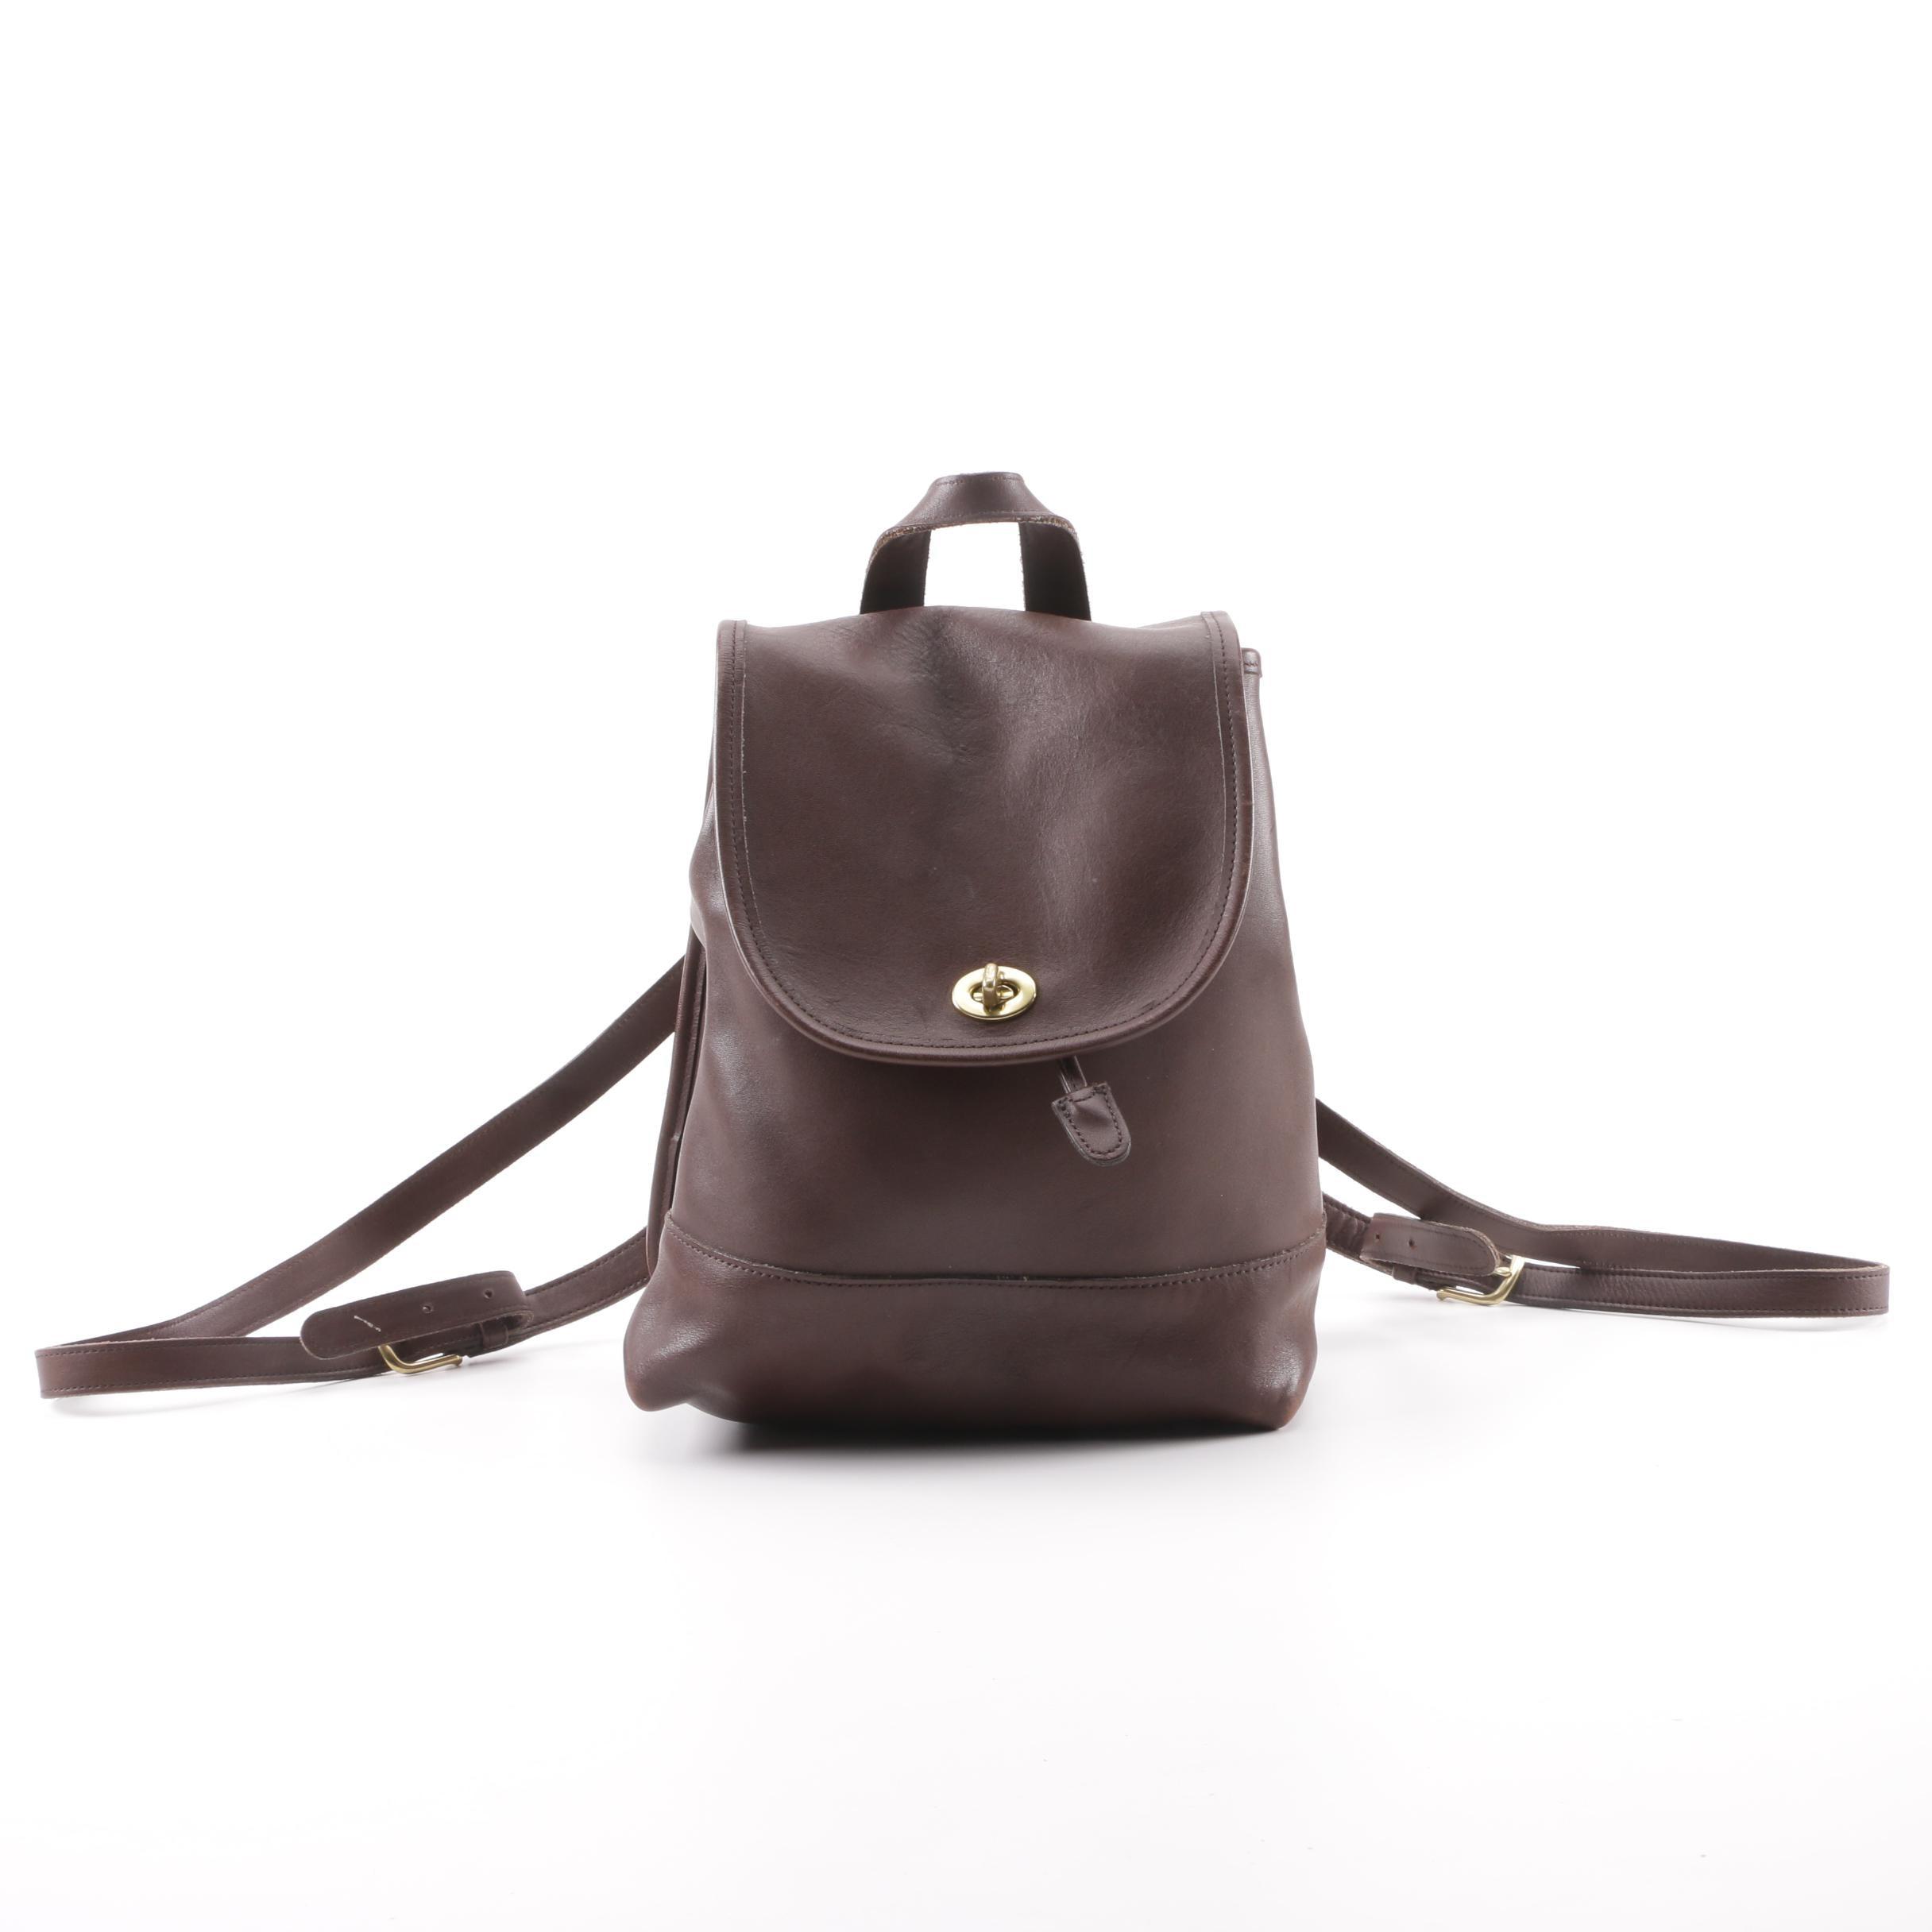 Vintage Coach Brown Leather Turnlock Flap Drawstring Daypack